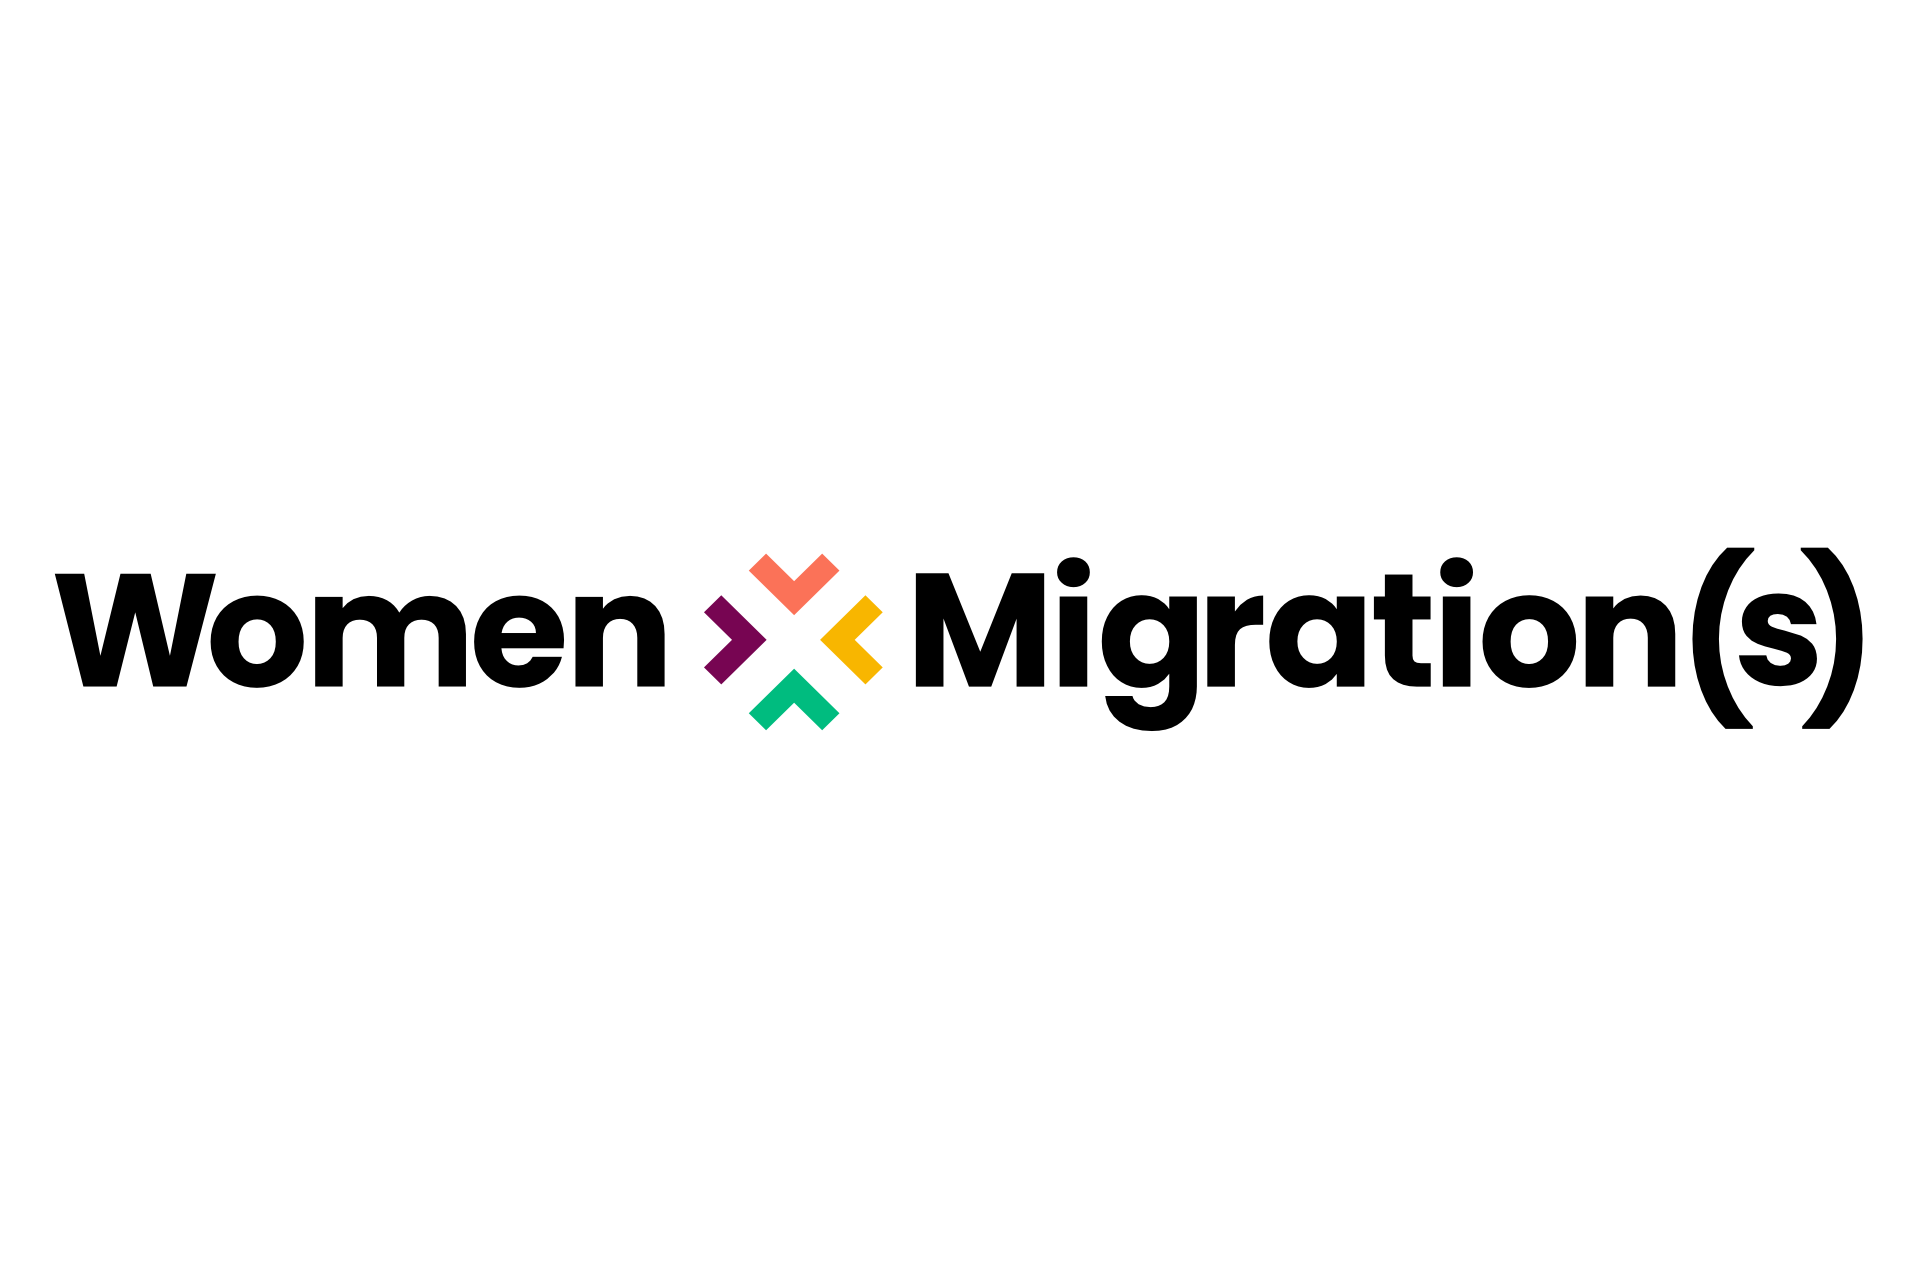 Women + Migration(s) logo